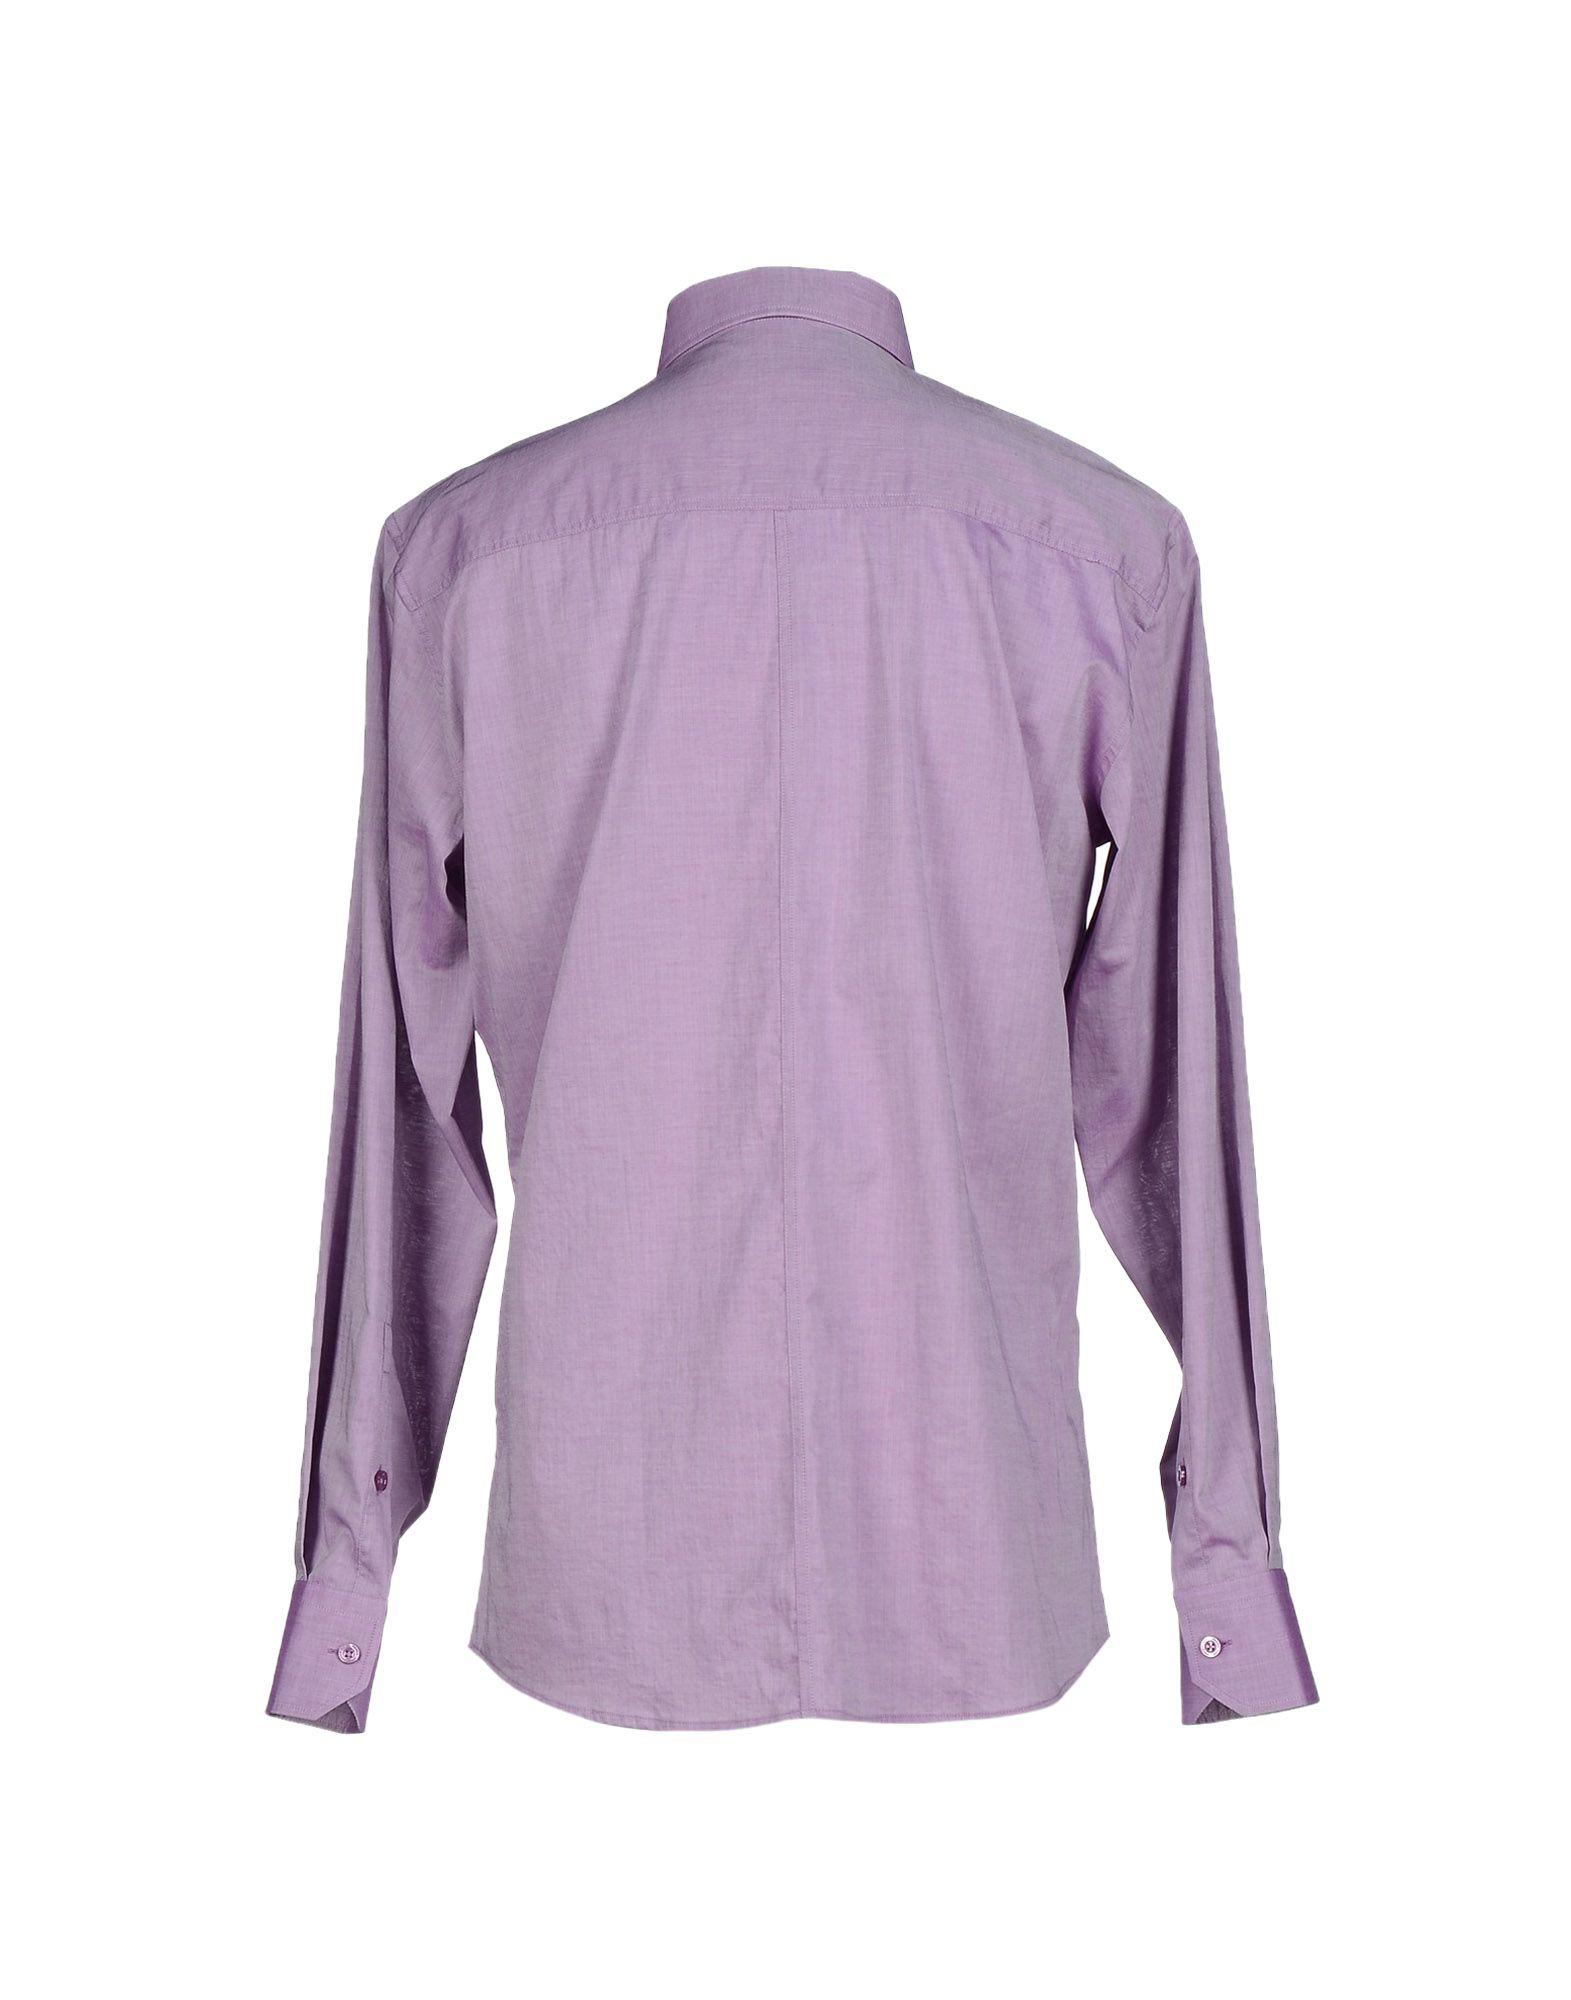 Versace jeans shirt in purple for men lyst Light purple dress shirt men